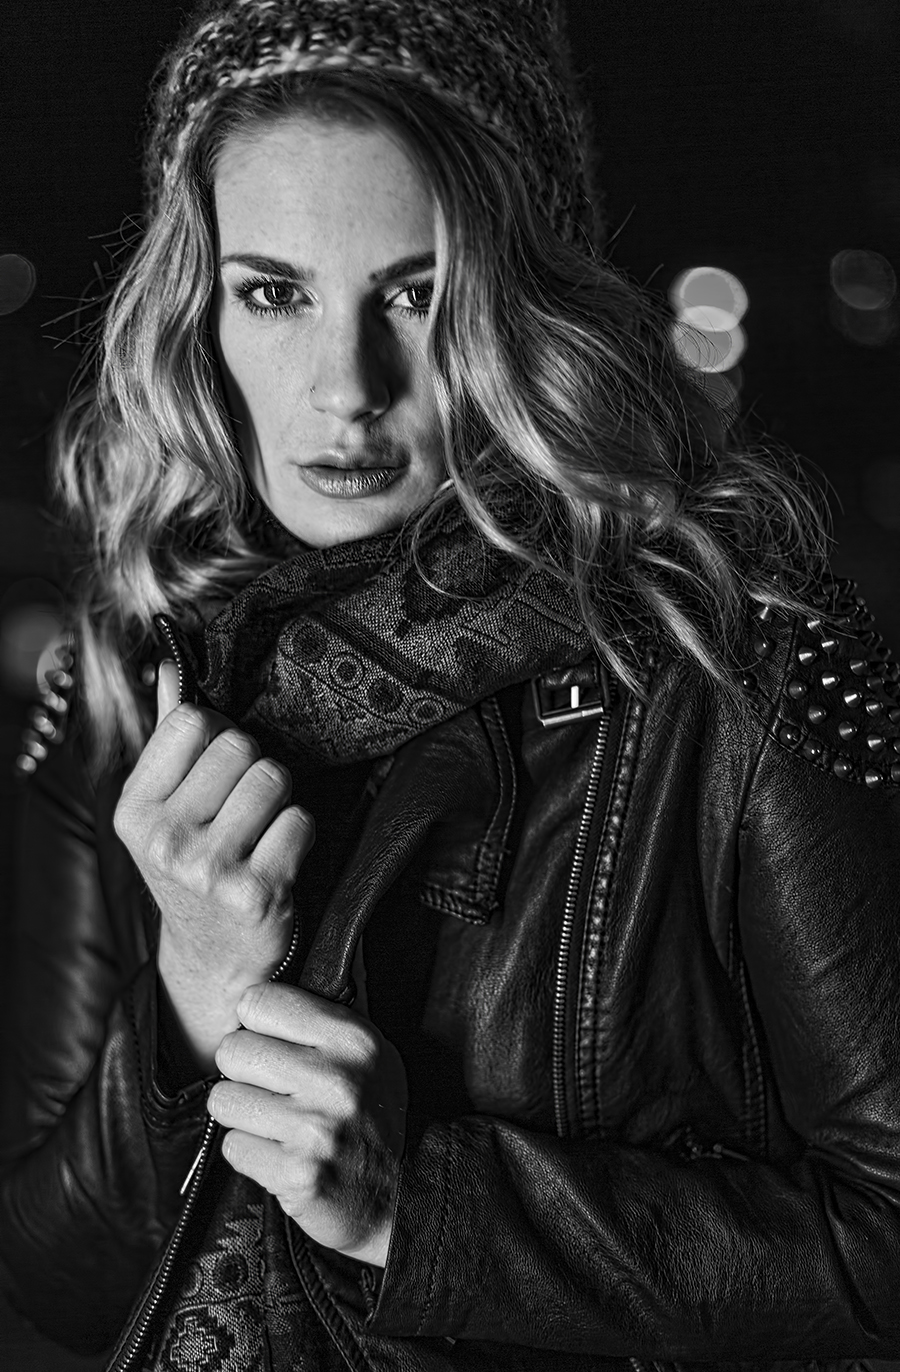 Photography by GaryMac Photography, Model Artemis Fauna / Uploaded 6th November 2015 @ 12:20 AM